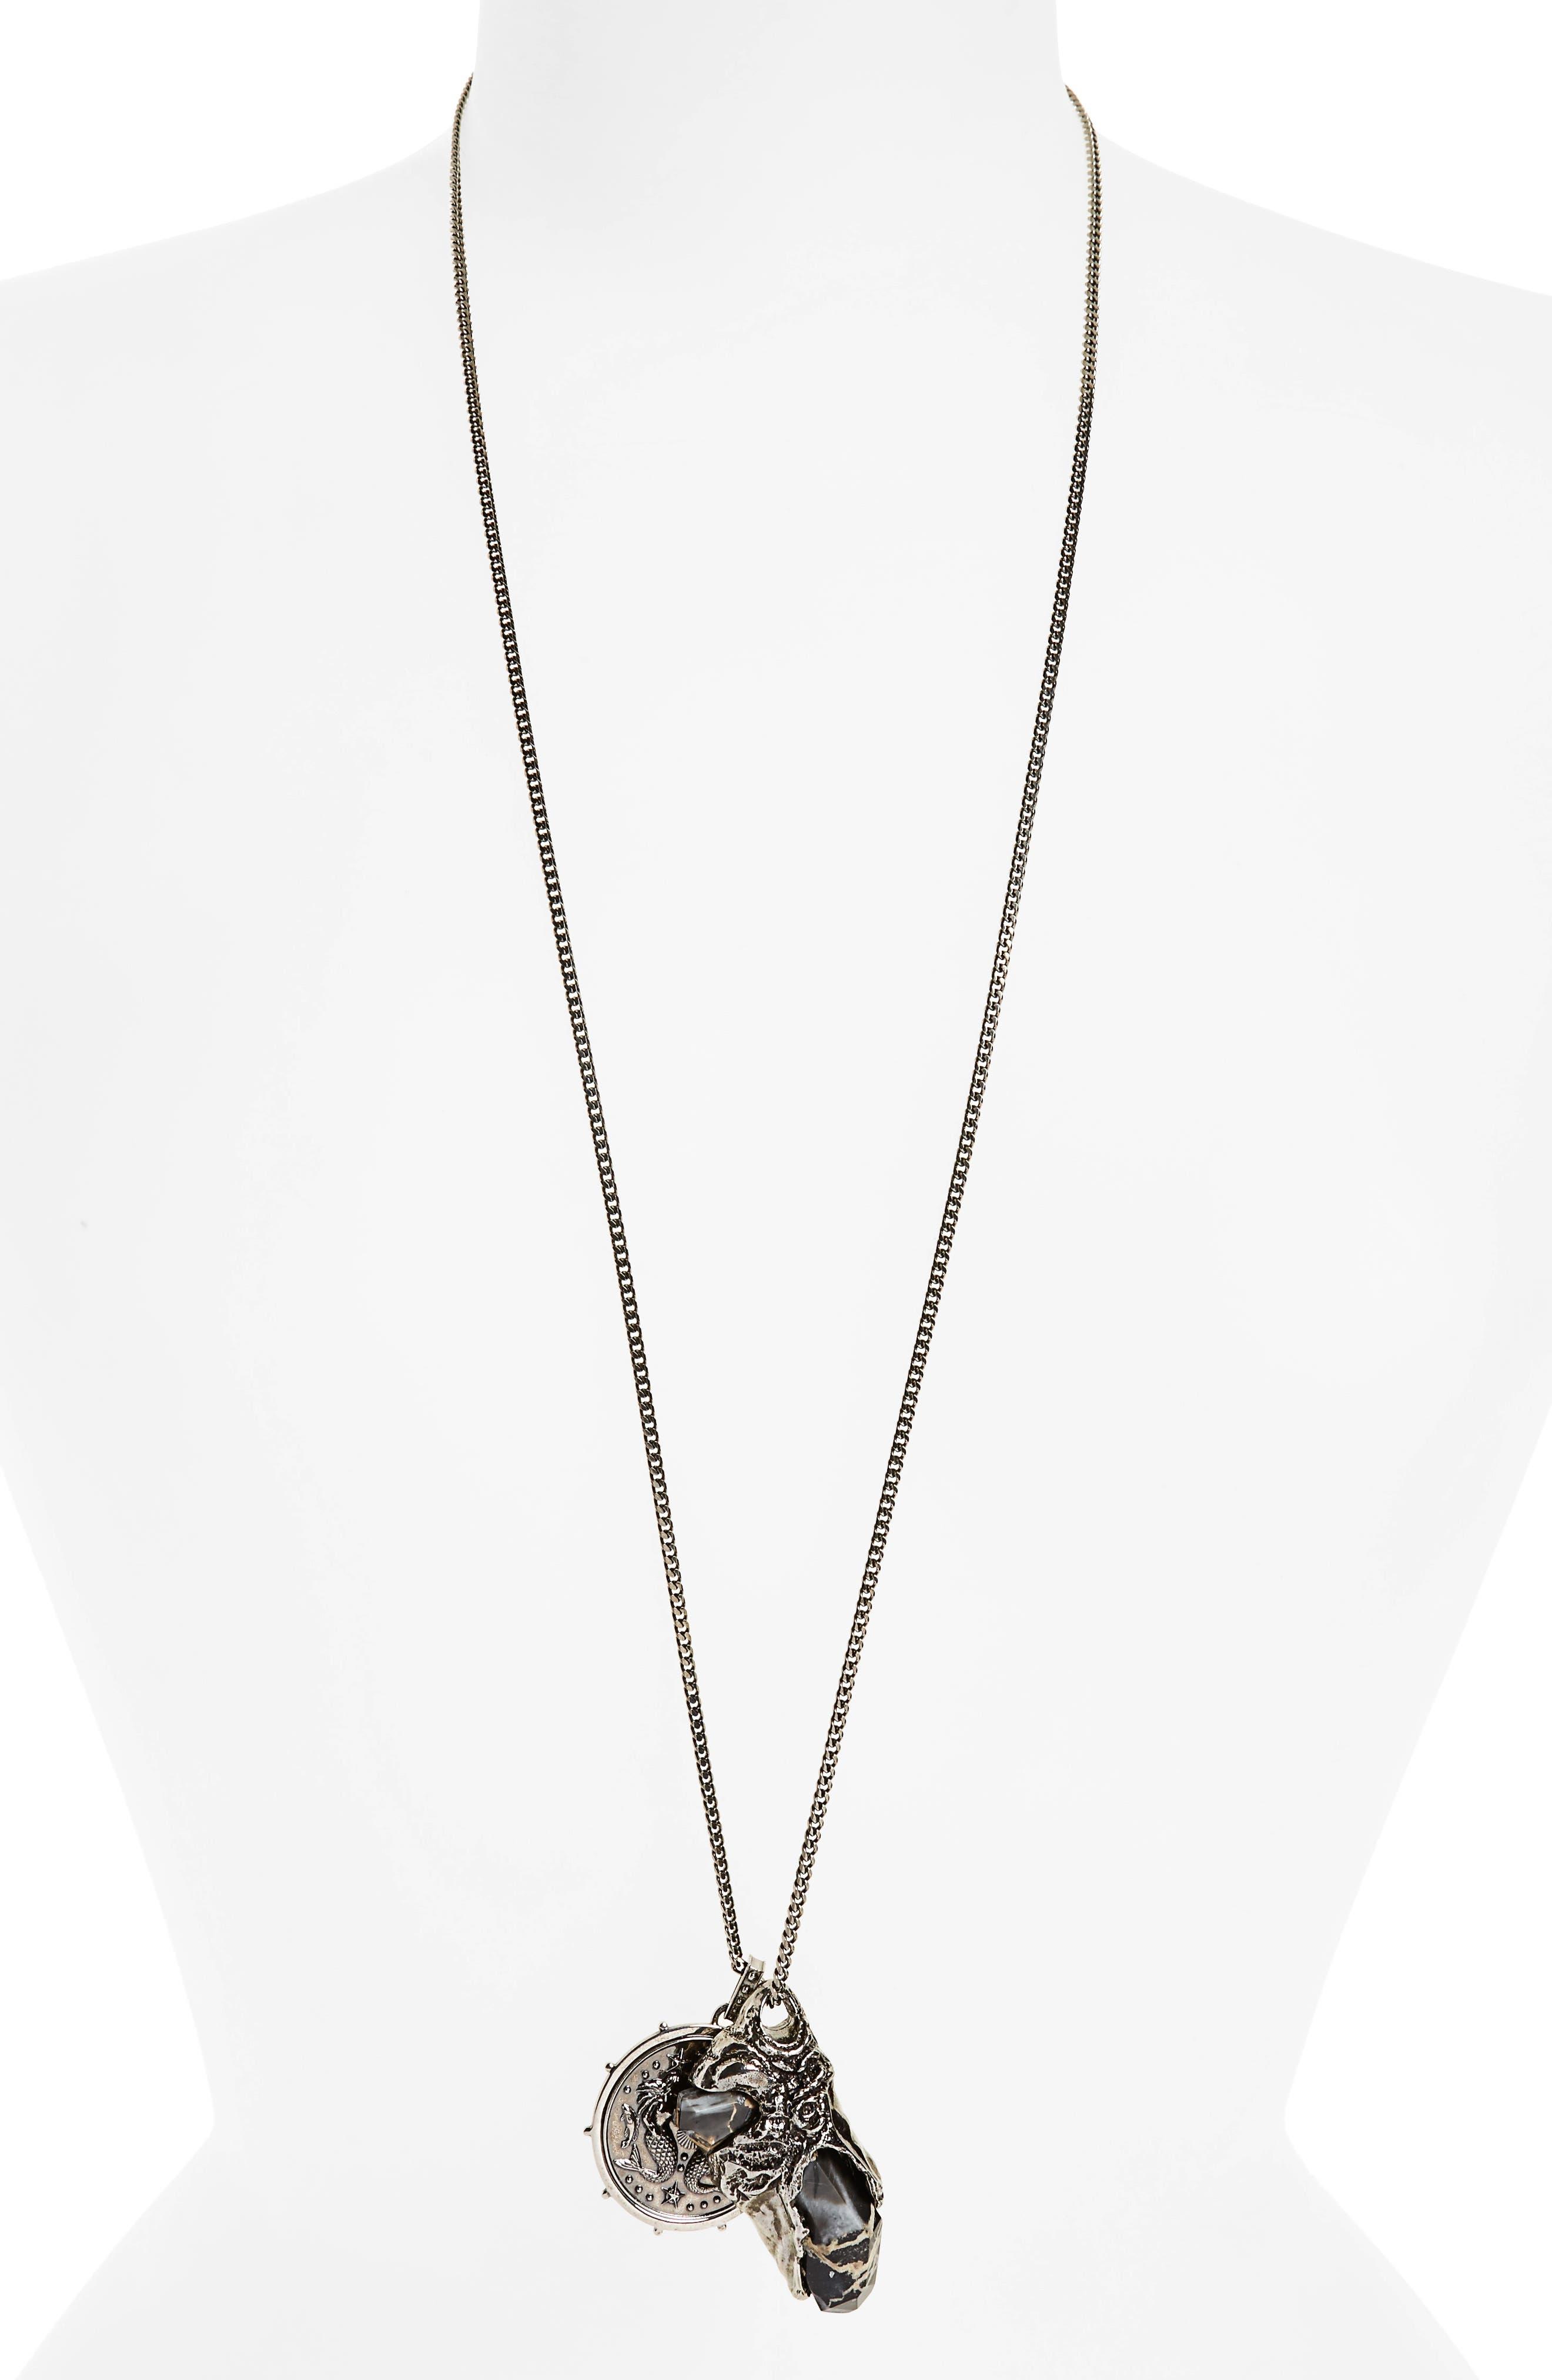 Medallion Pendant Necklace,                             Main thumbnail 1, color,                             ANTIQUE SILVER/ BLACK PORTORO